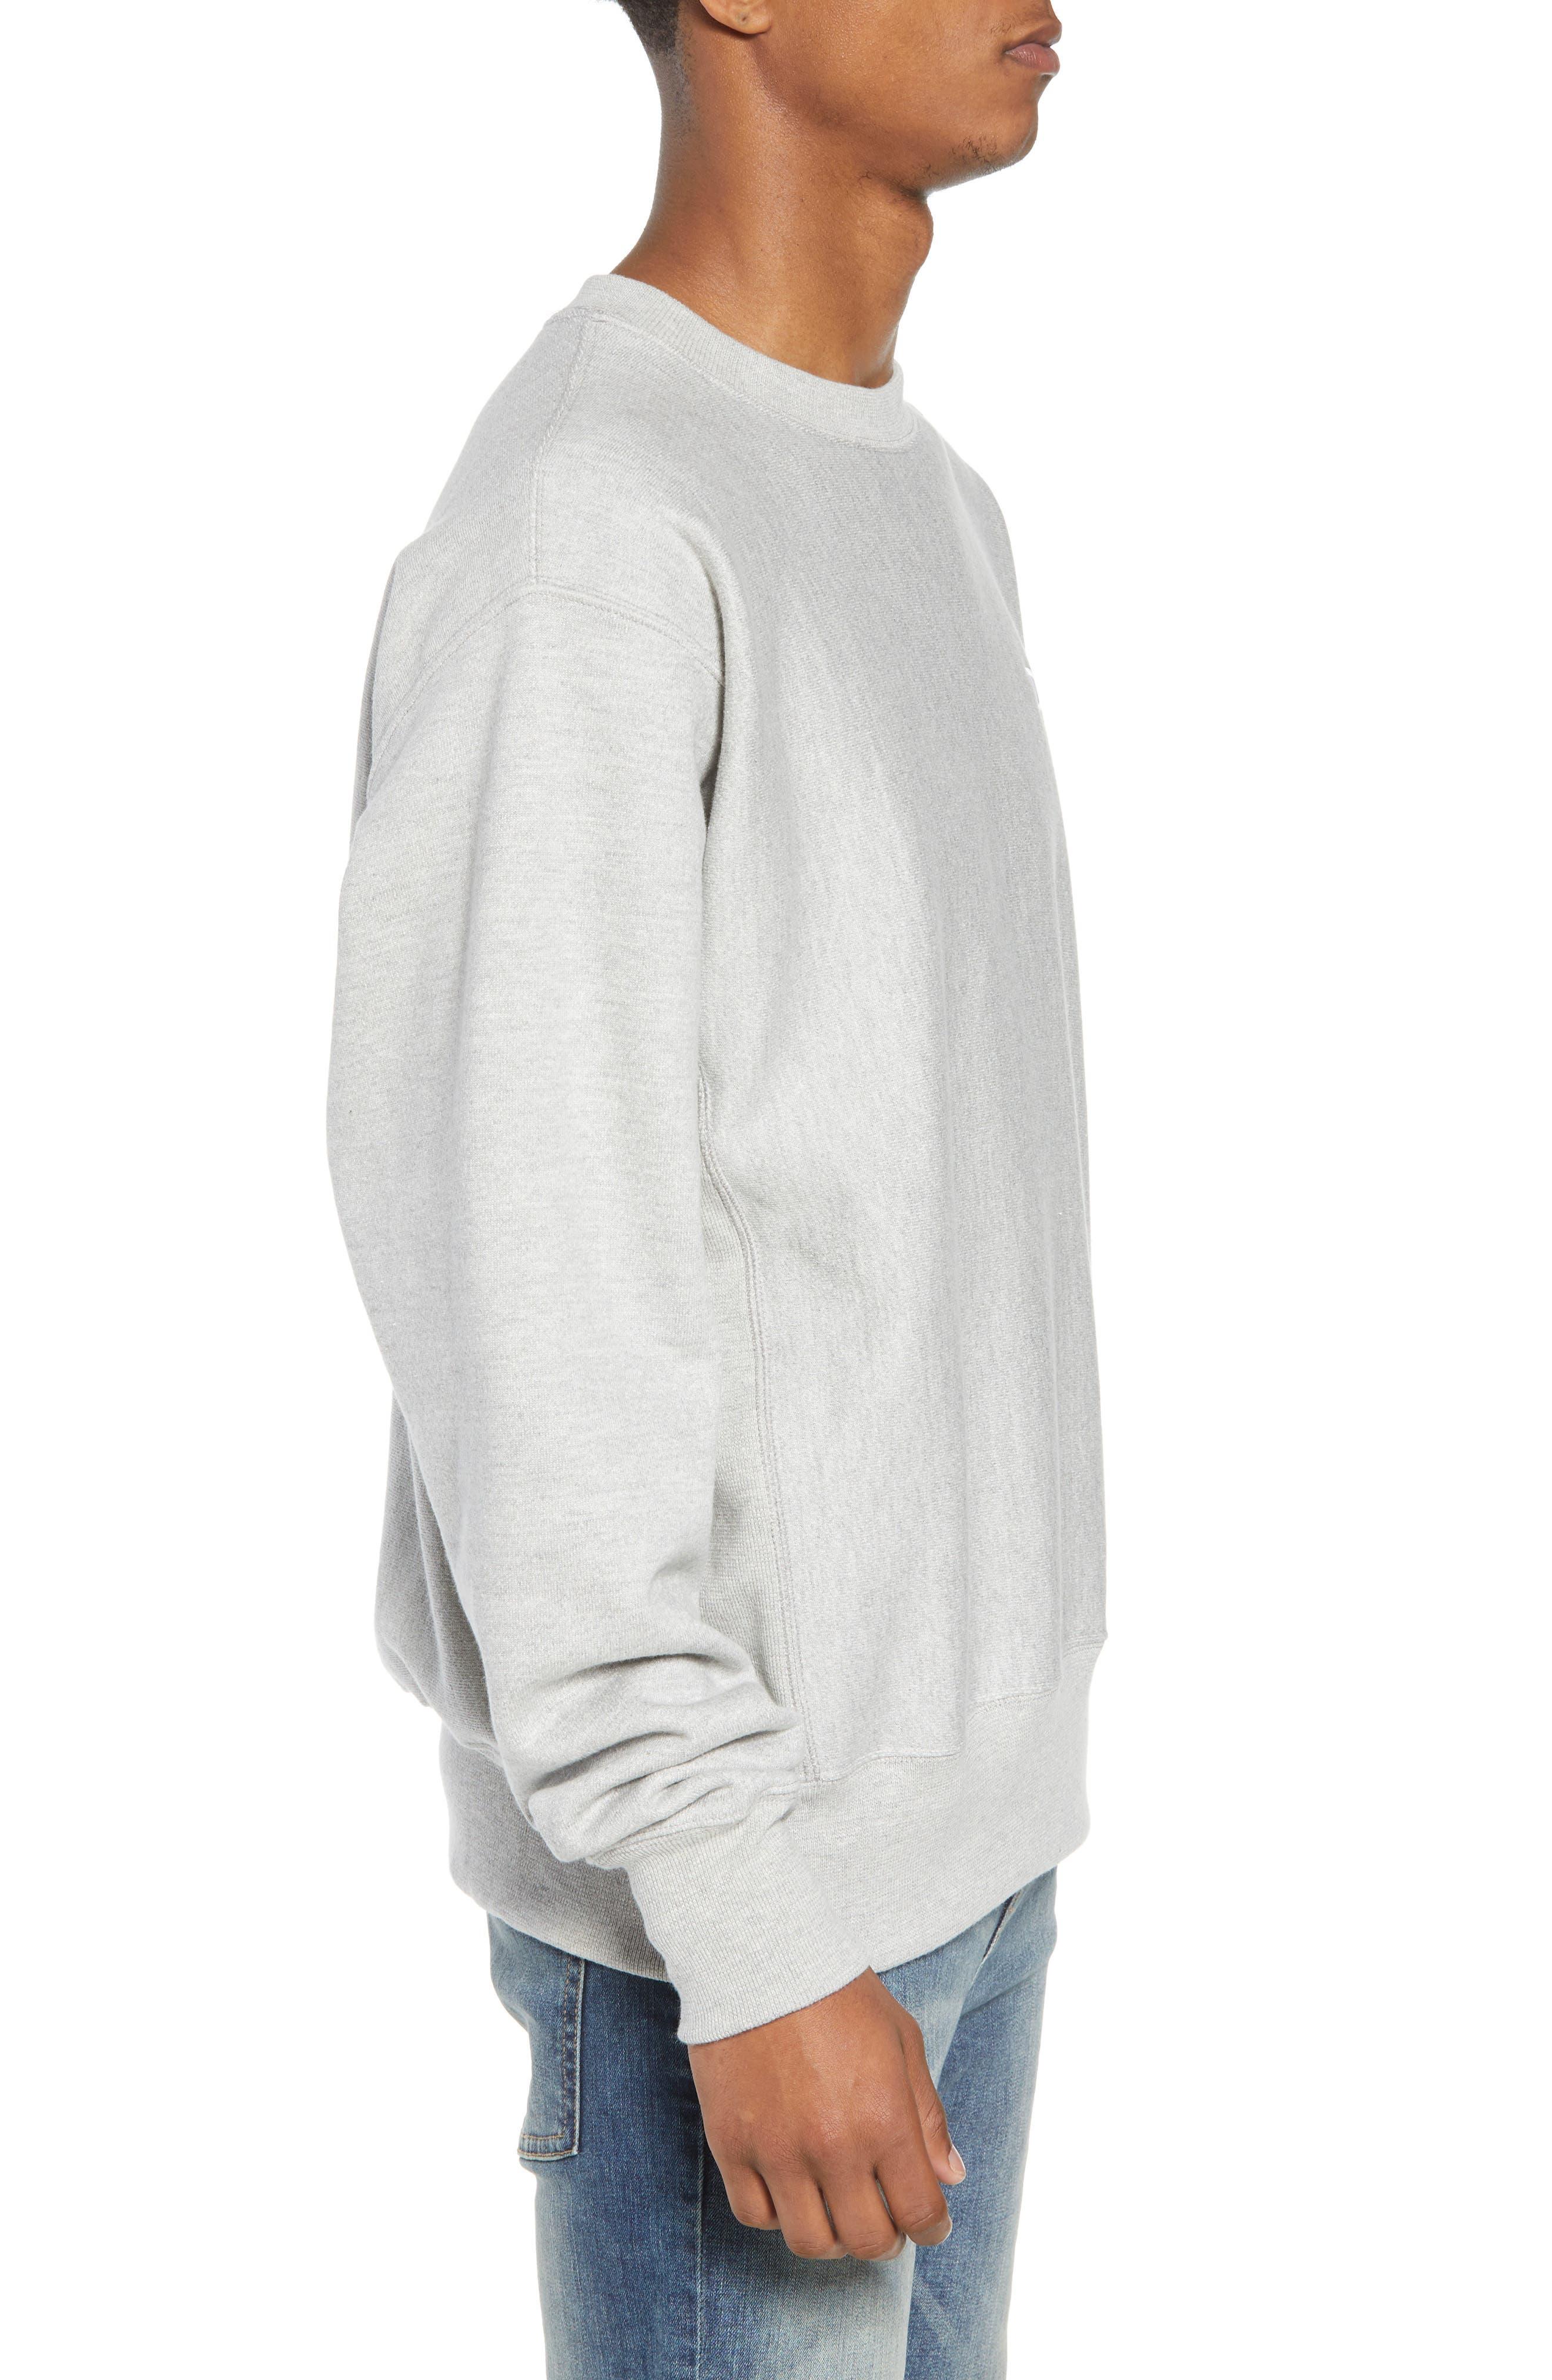 CHAMPION, Reverse Weave Sweatshirt, Alternate thumbnail 3, color, OXFORD GRAY